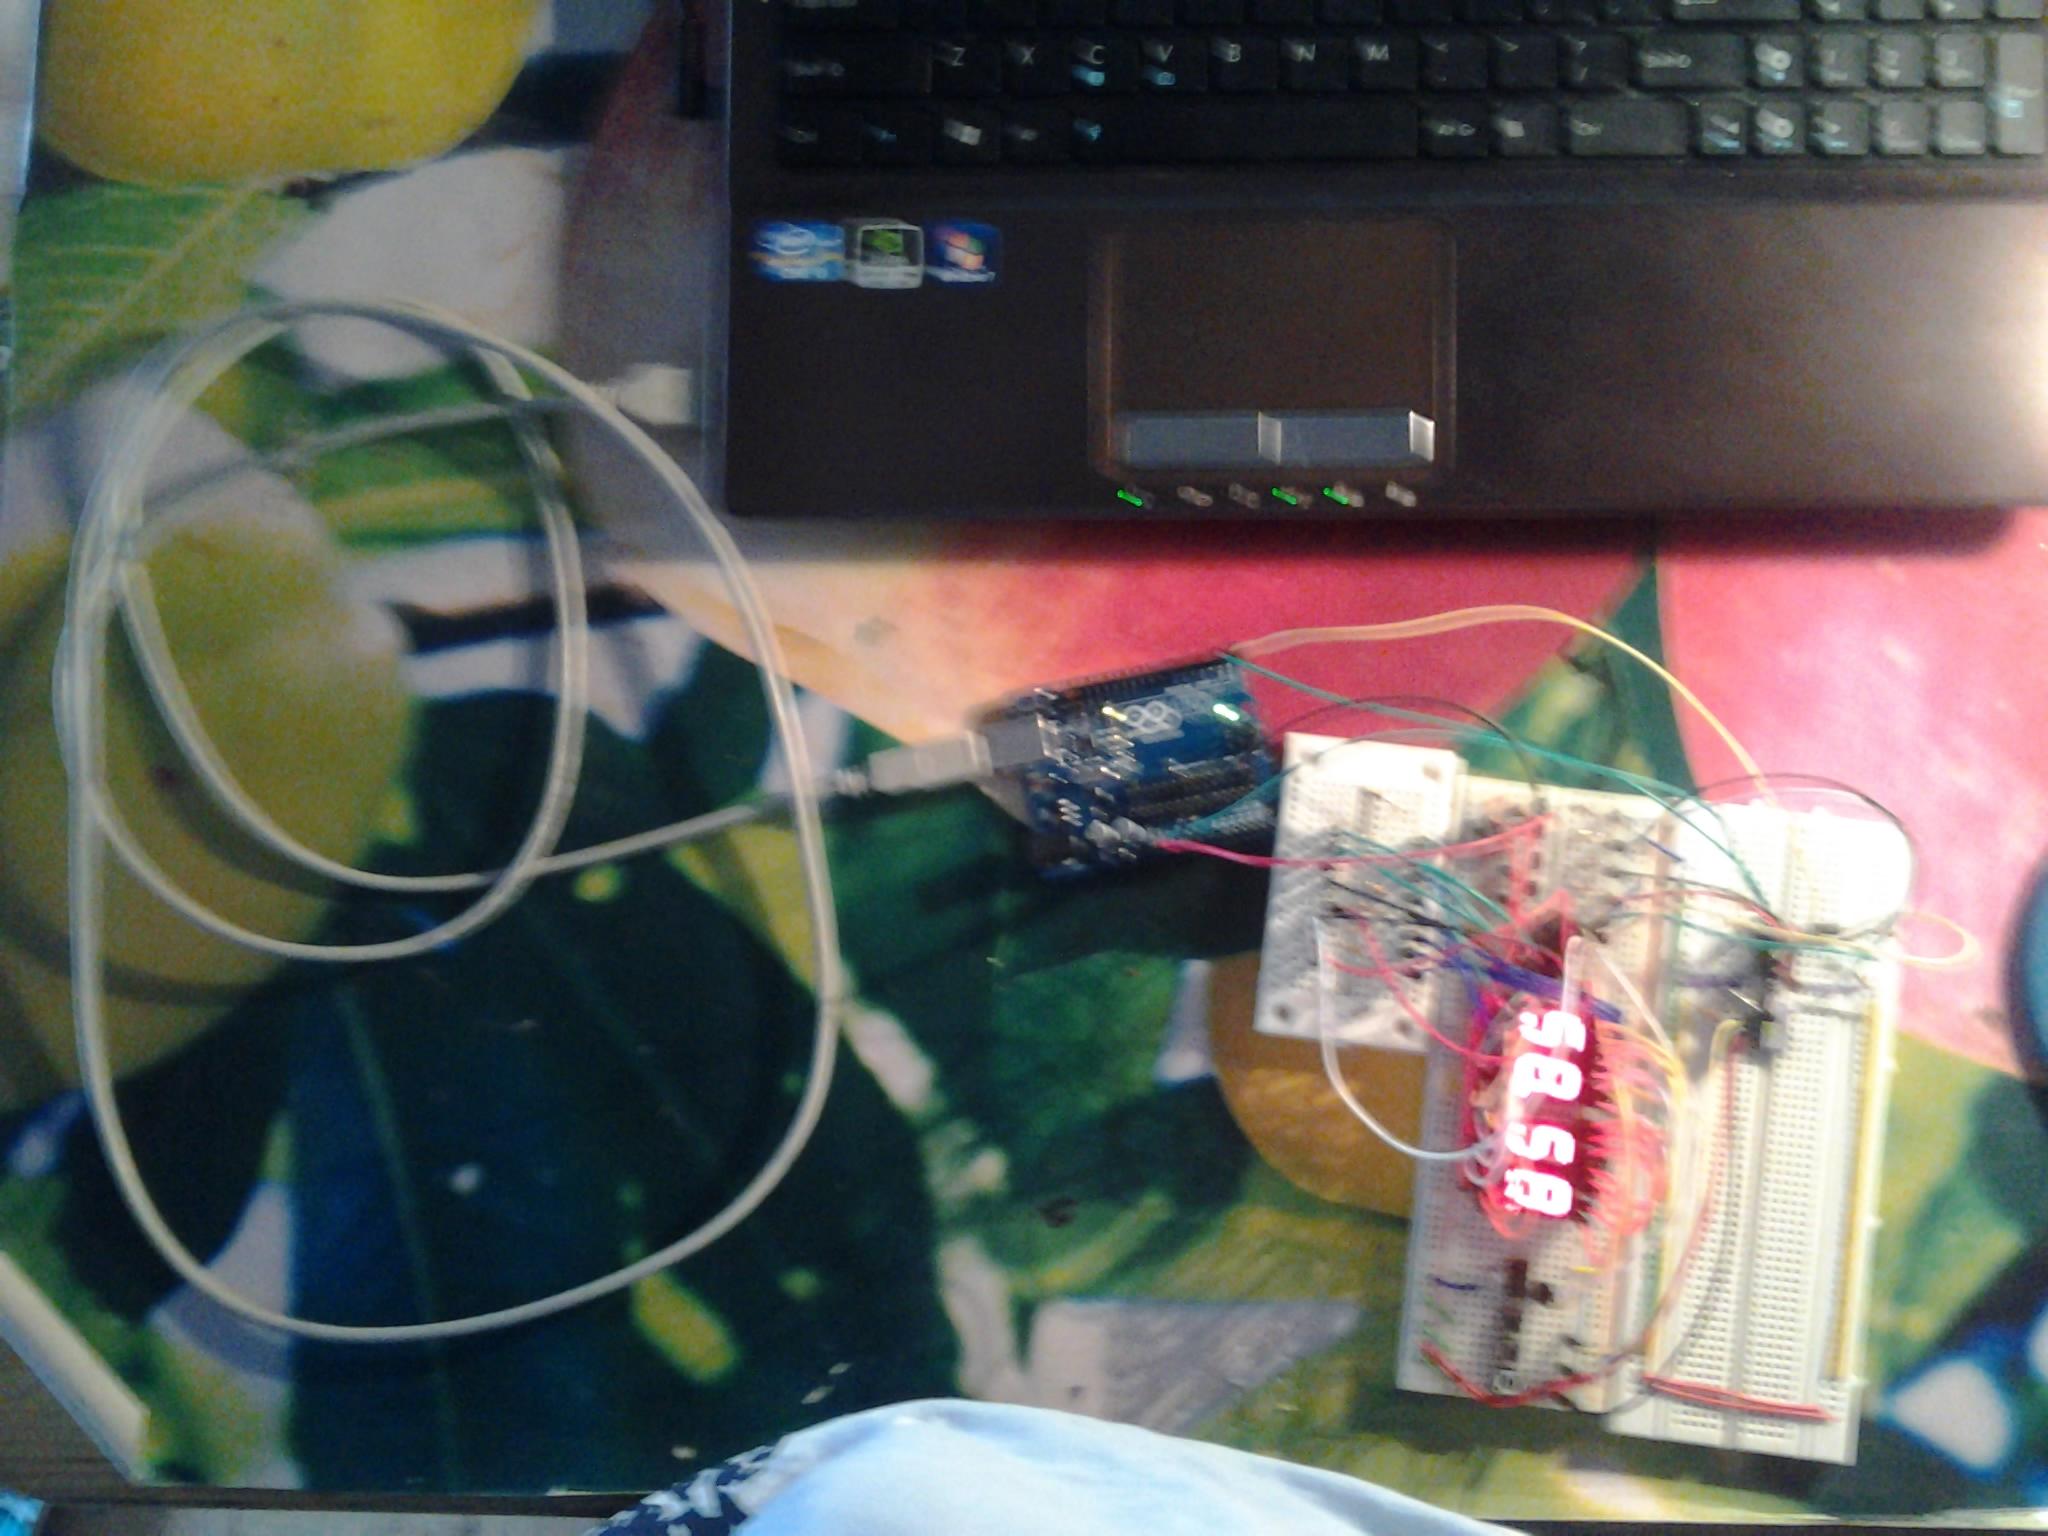 Arduino uno r avrdude stk getsync not in sync